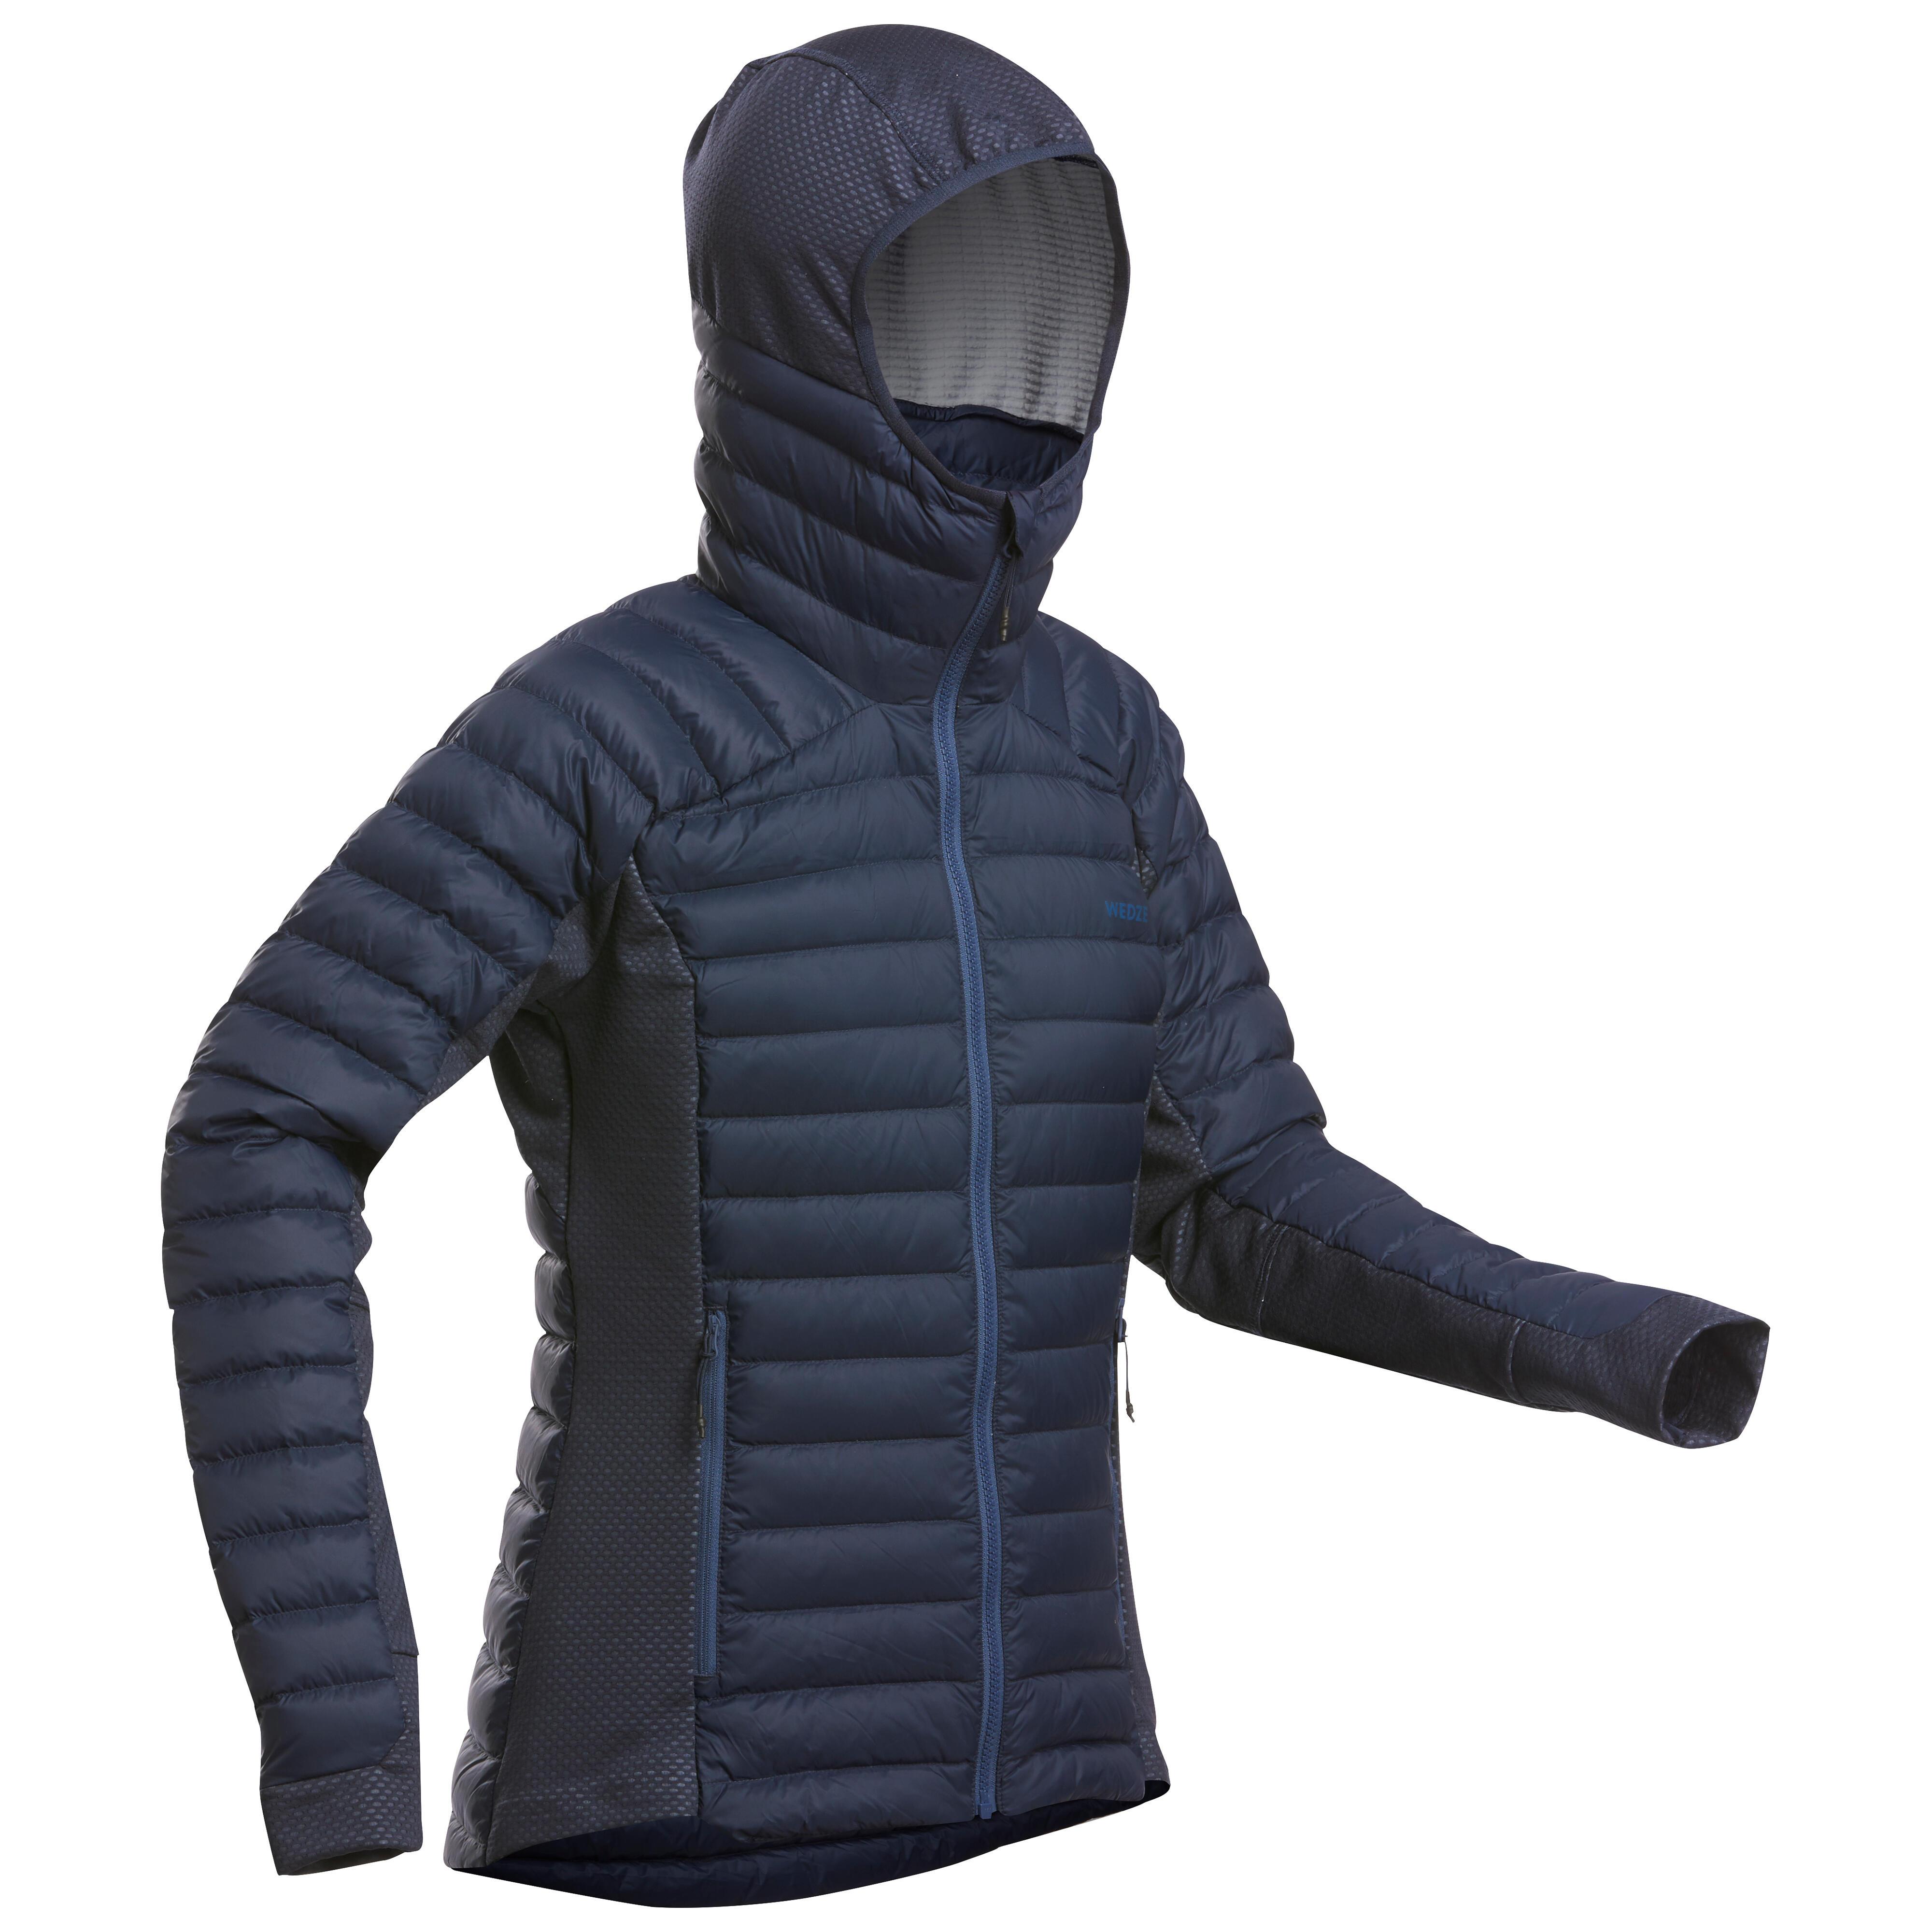 Jachetă schi FR900 WARM Damă imagine